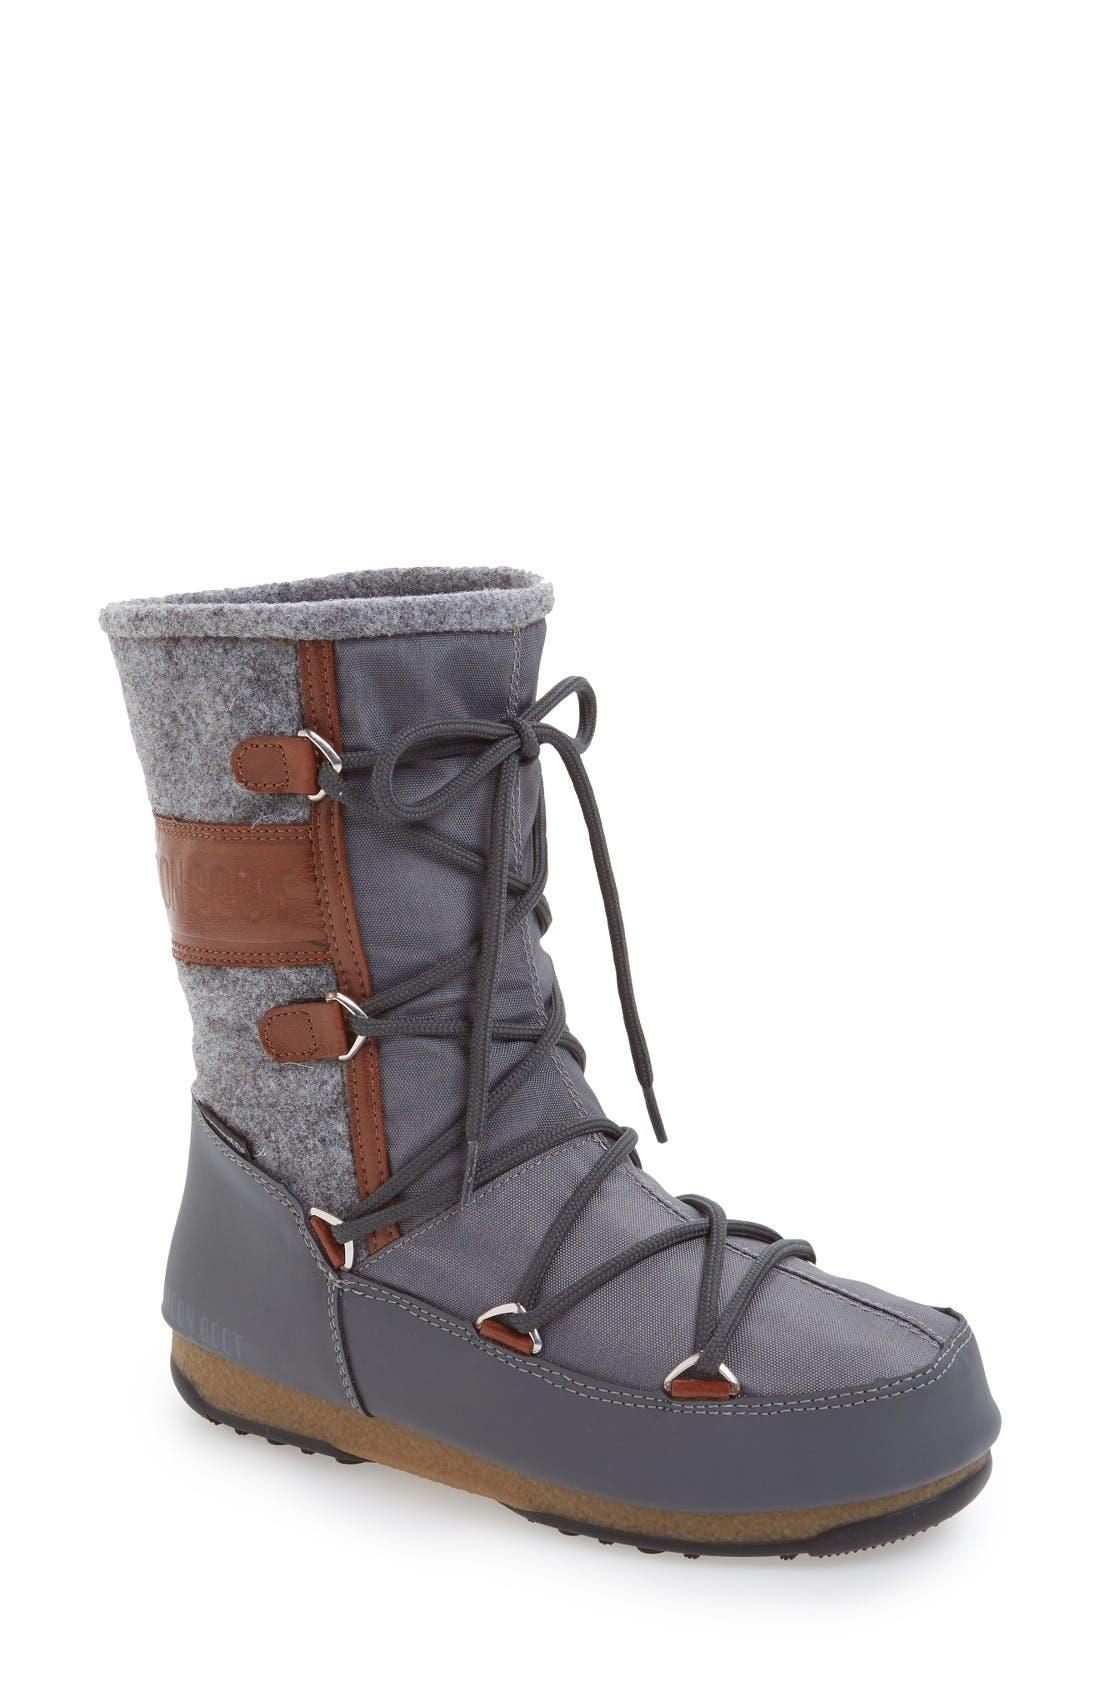 Alternate Image 1 Selected - Tecnica® Vienna Waterproof Moon Boot® (Women)